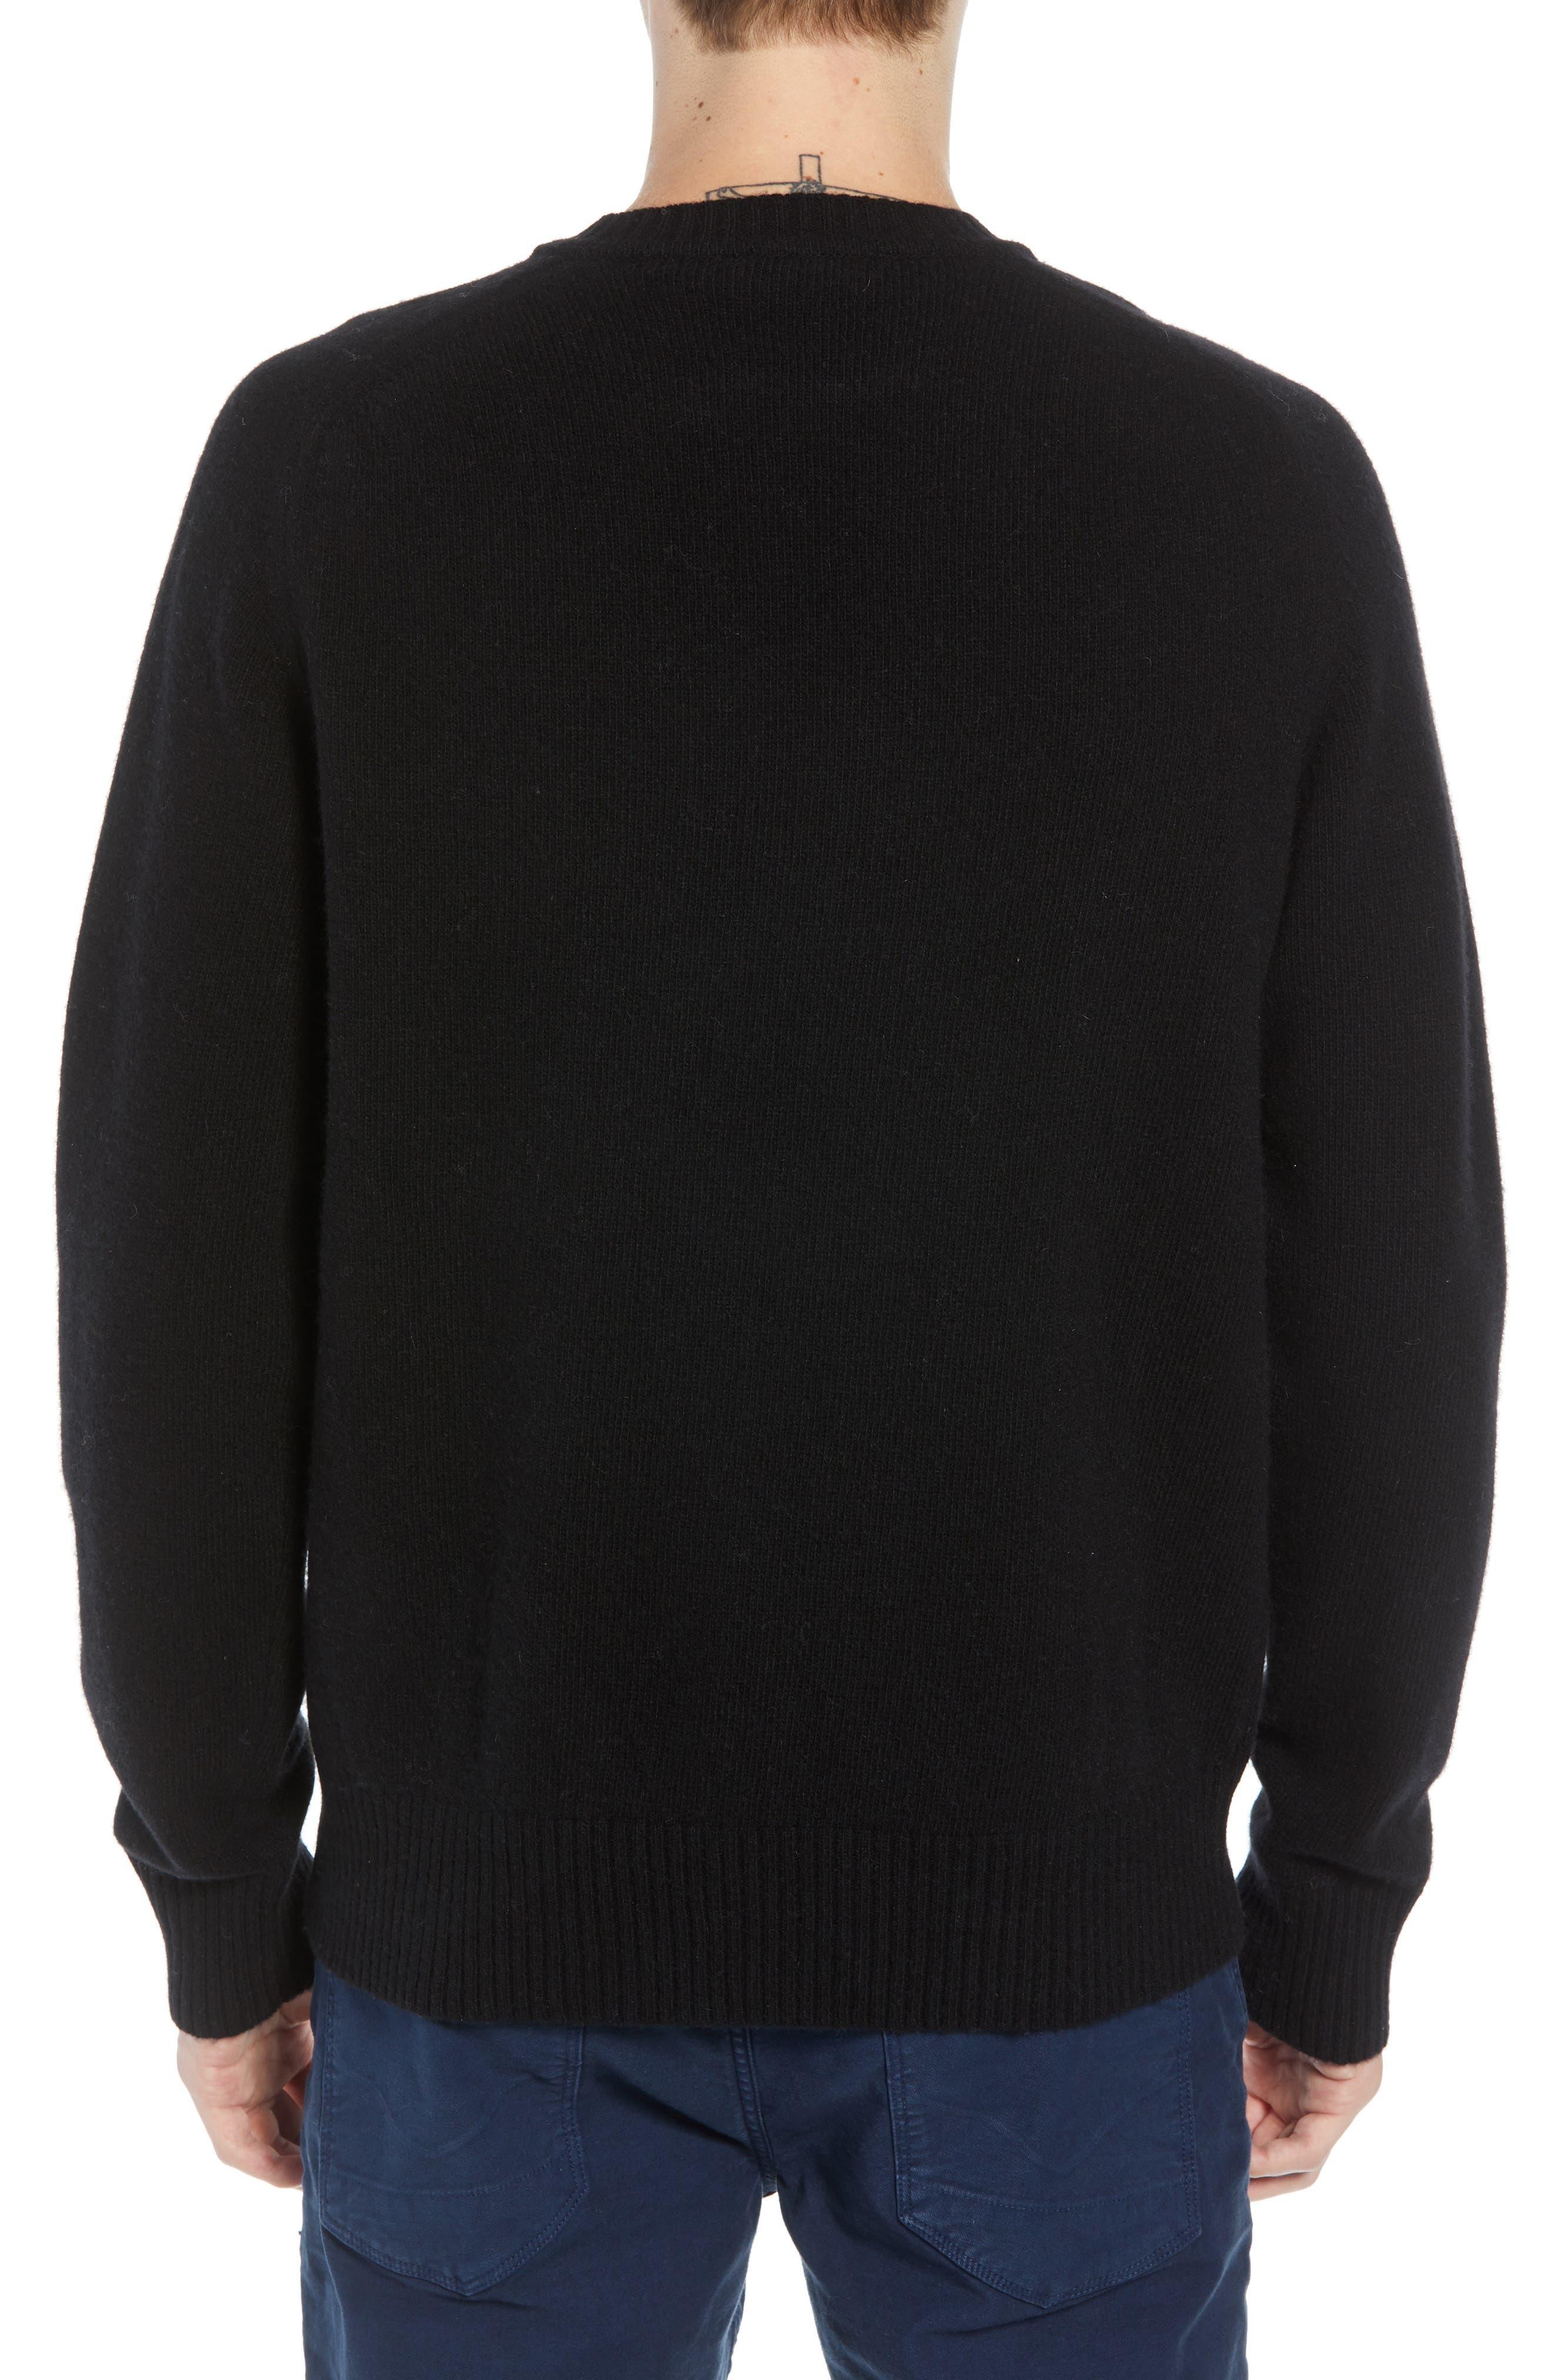 Bonjour Wool Blend Sweater,                             Alternate thumbnail 2, color,                             BLACK WHITECAP GREY